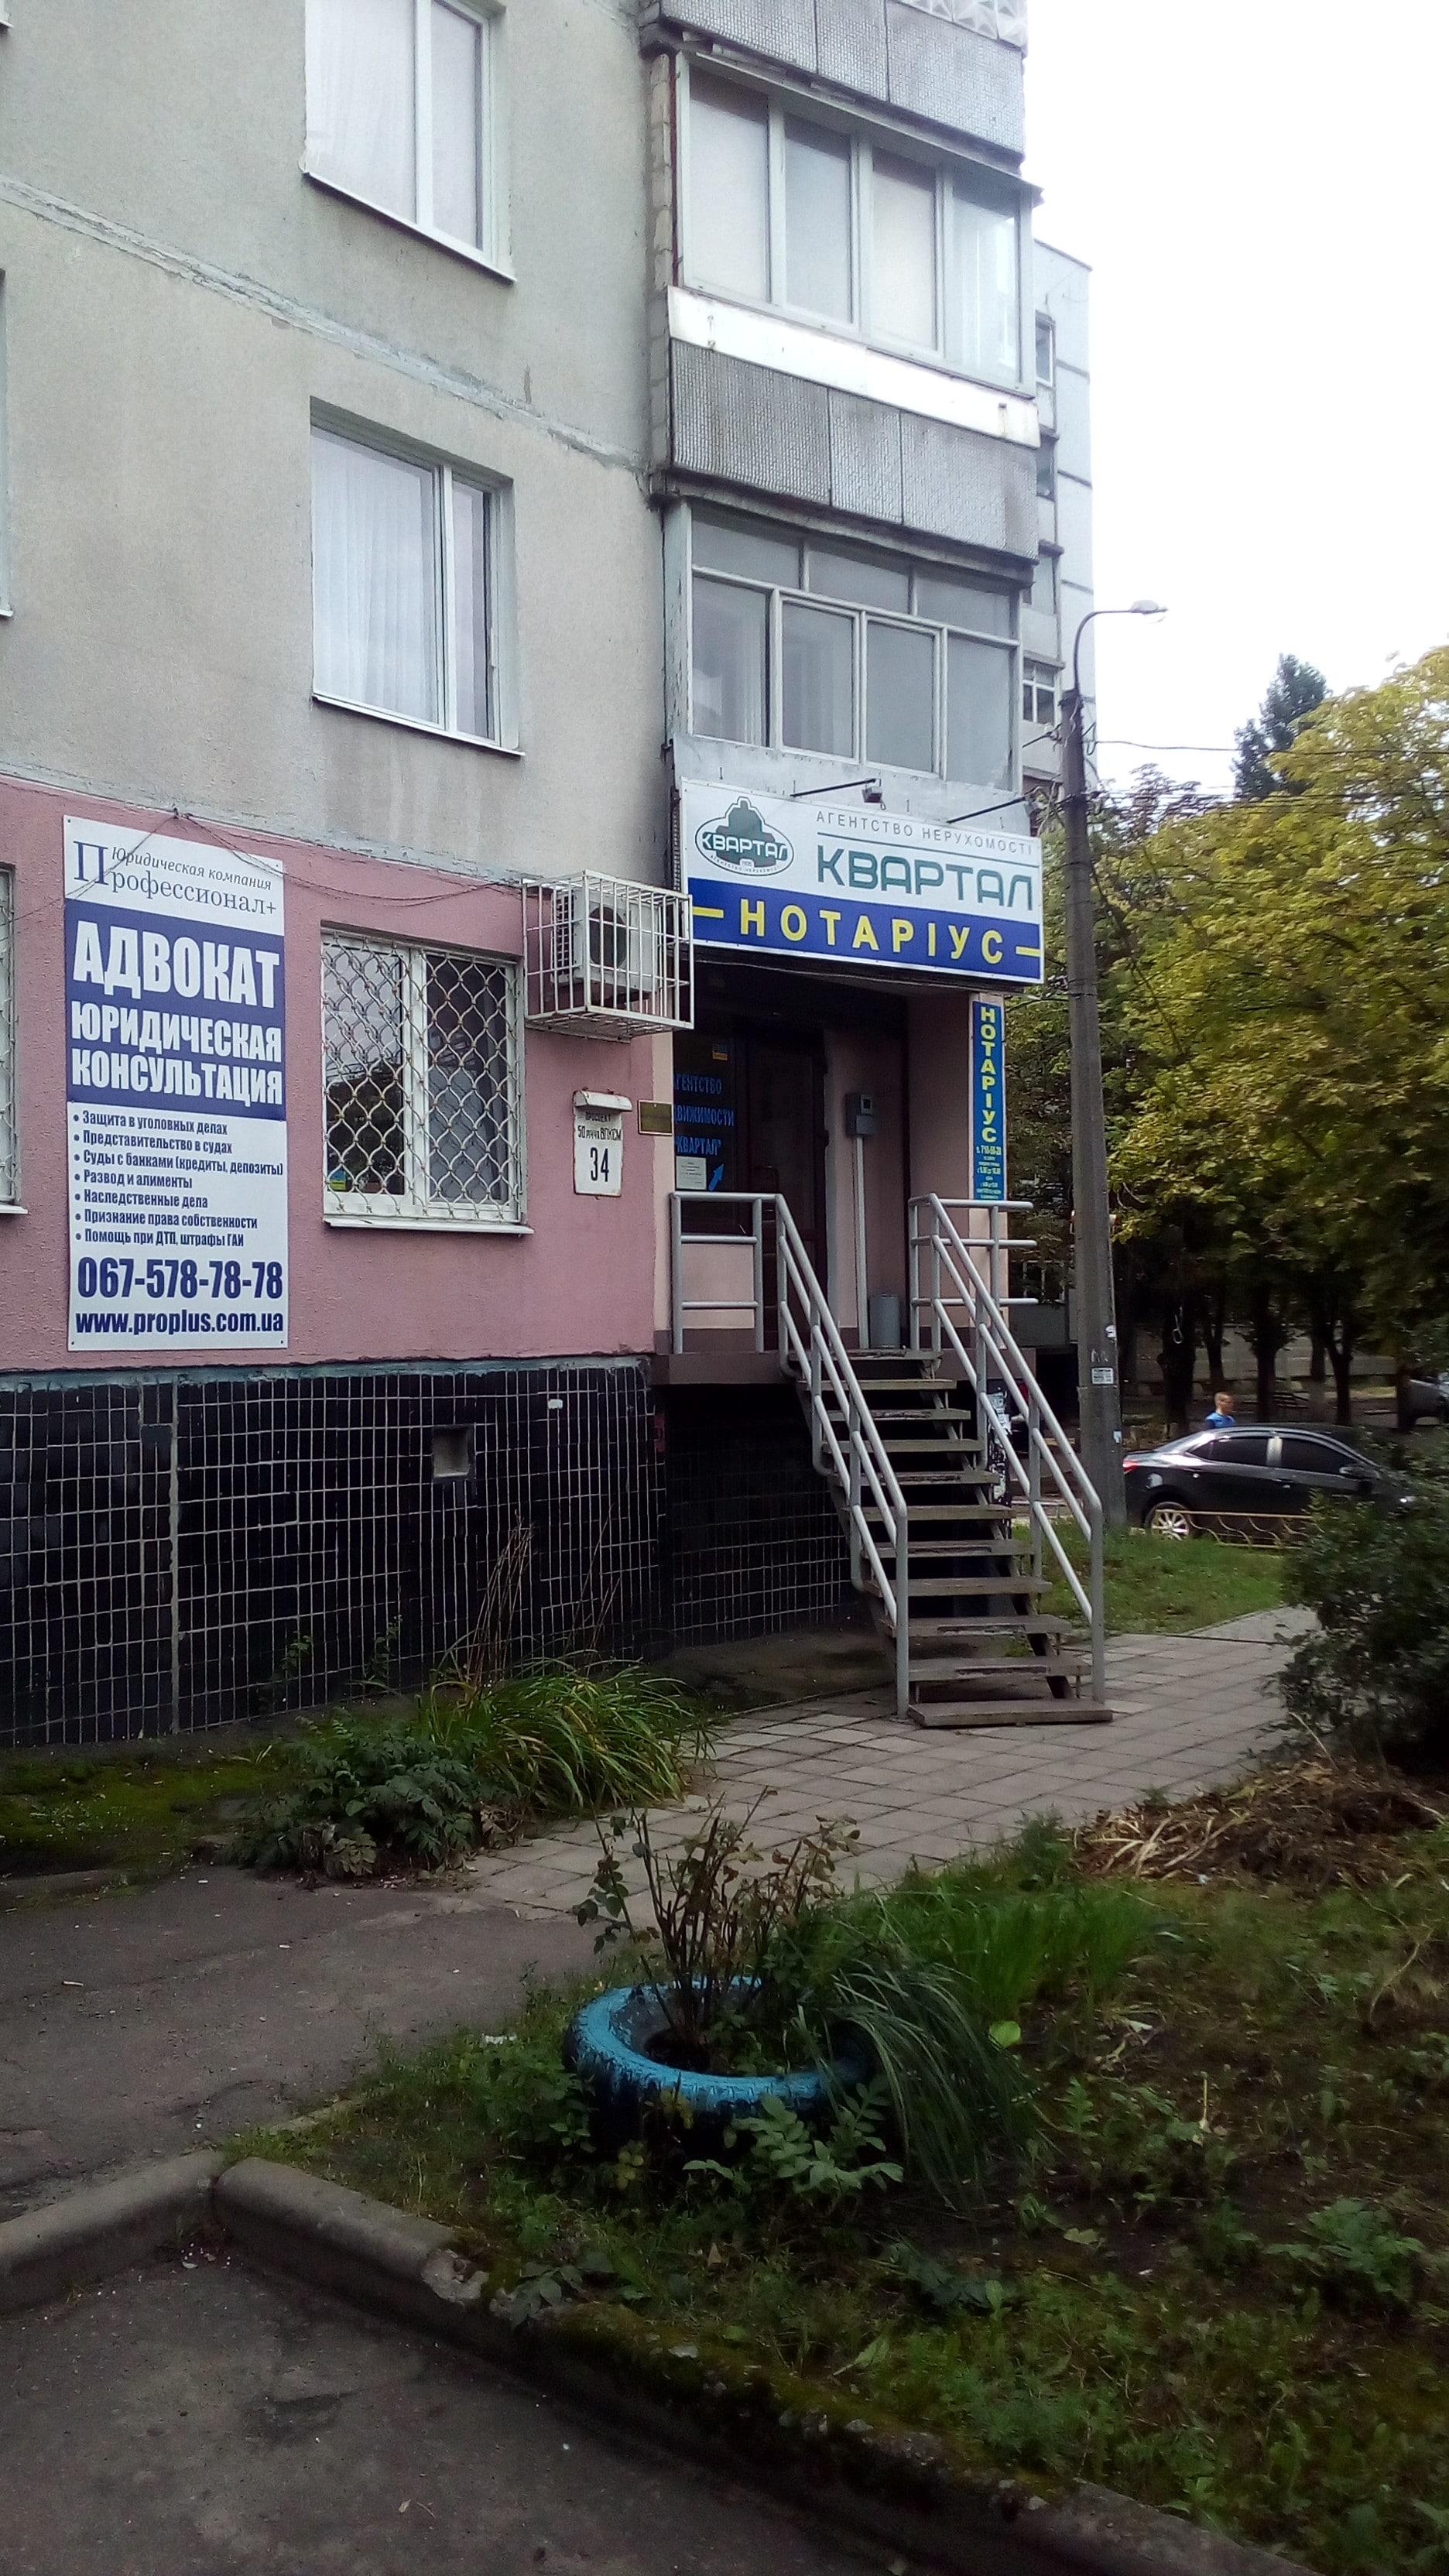 Агентство недвижимости Квартал на Салтовке (пр.Юбилейный) (yubileynyi)